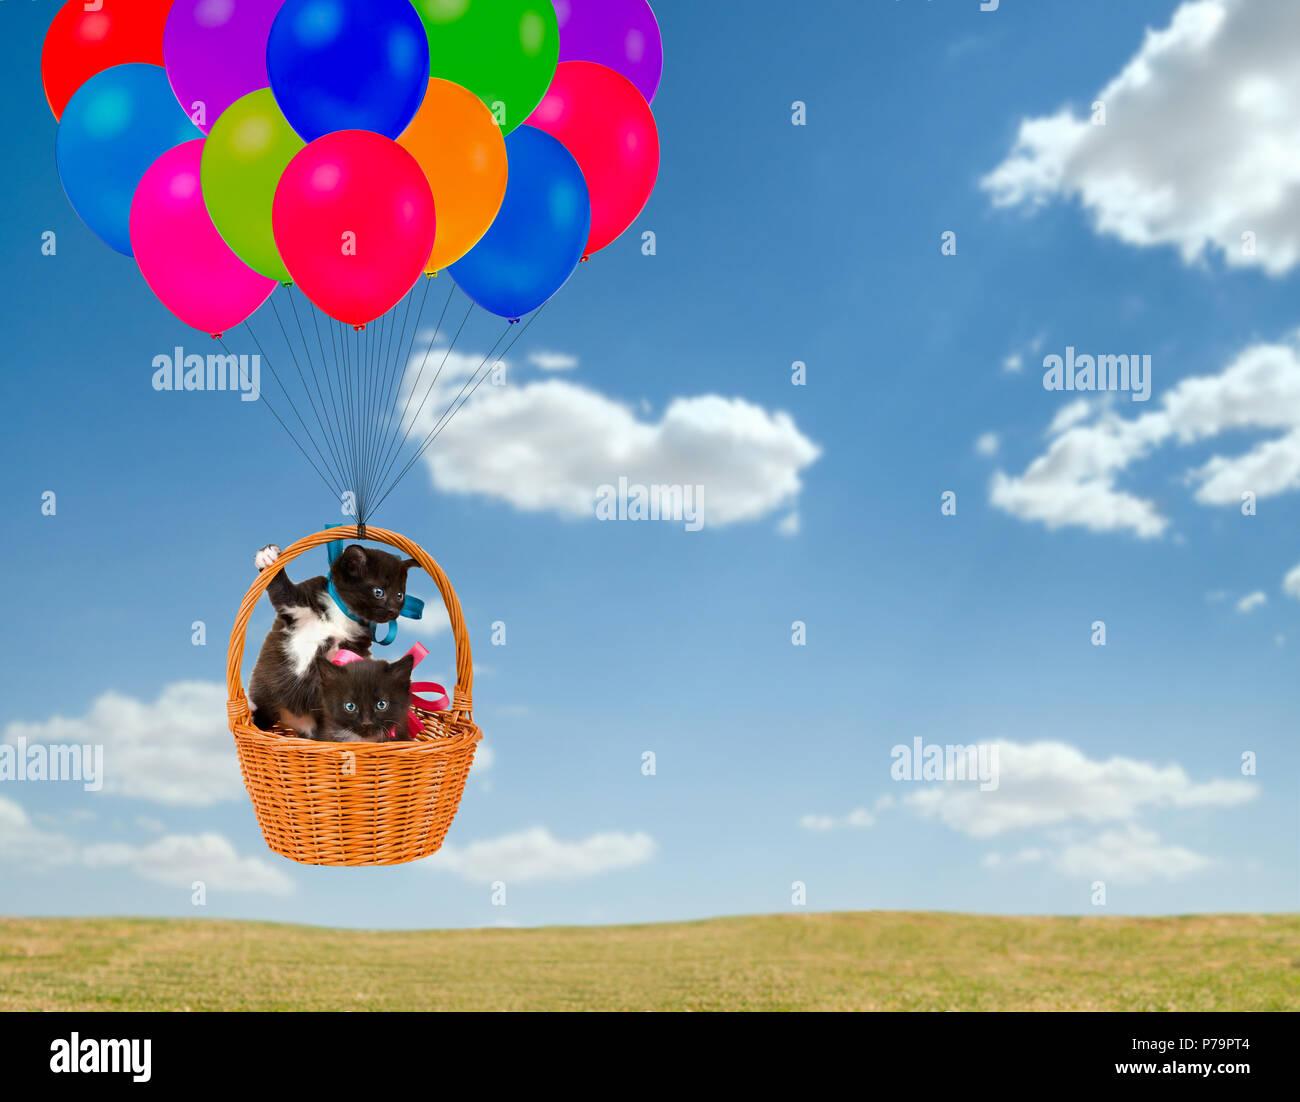 kittens fly in  basket on multicoloured balloon, outdoor - Stock Image